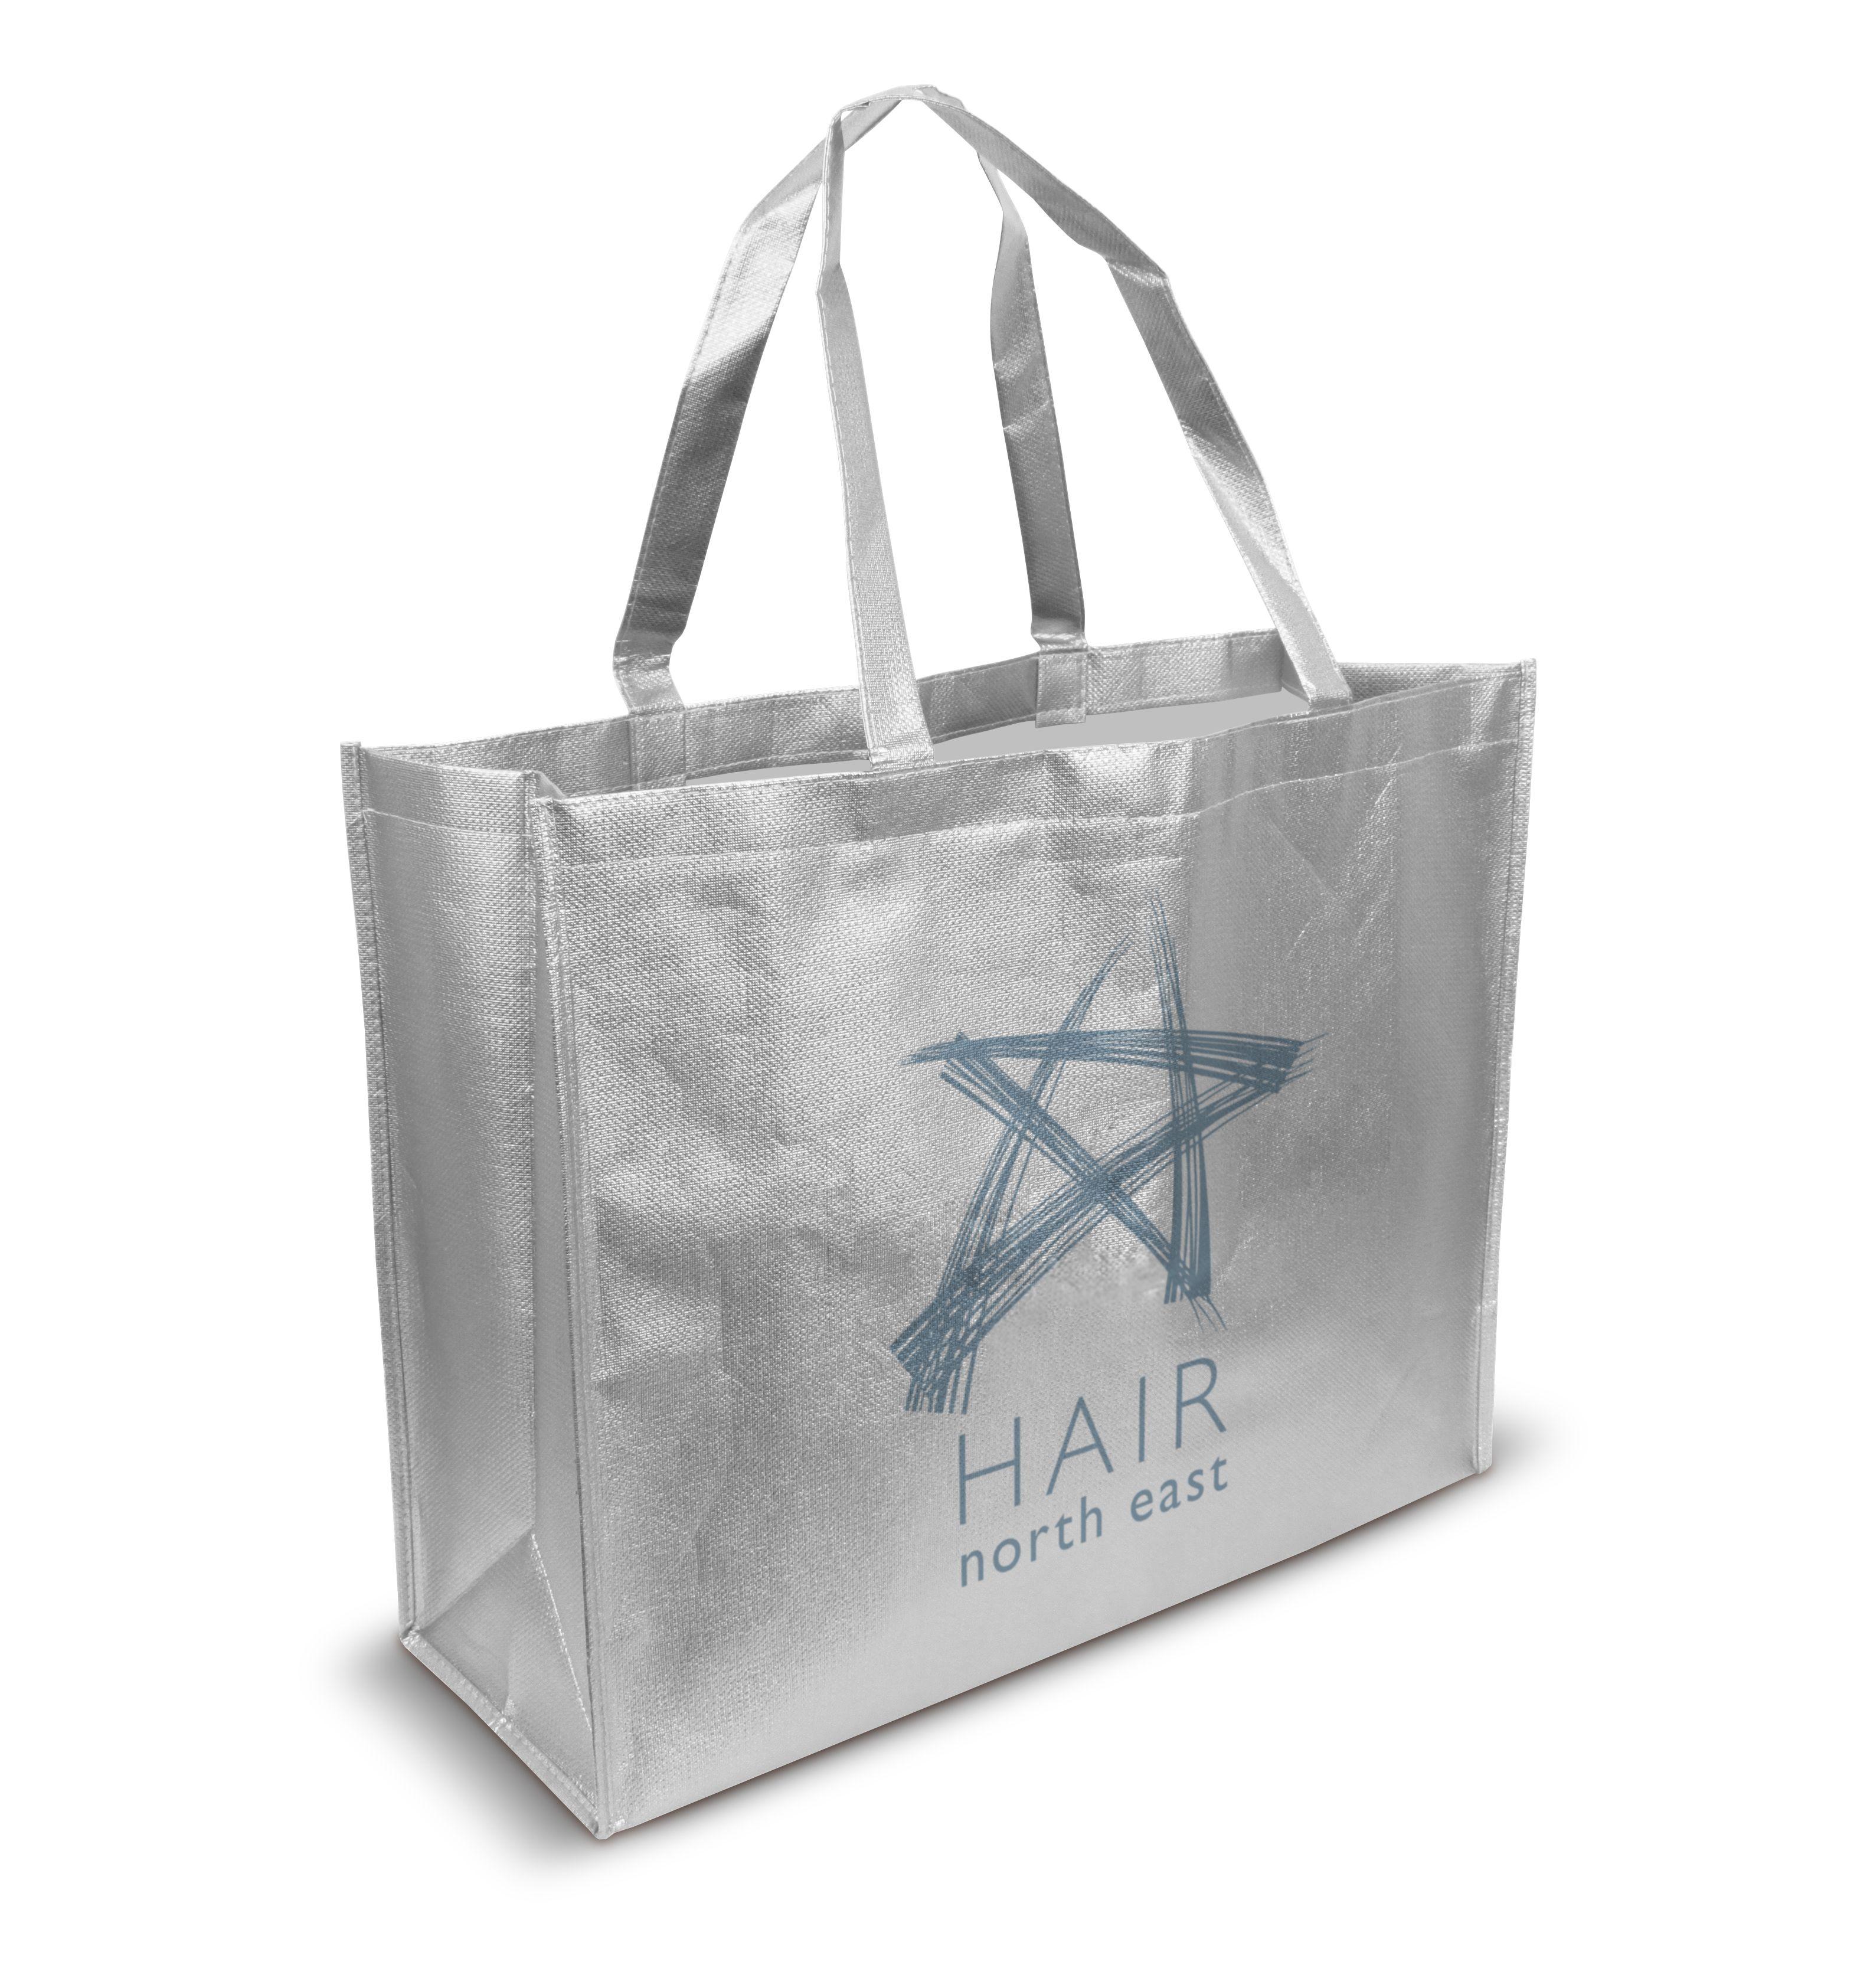 Printed Bag Directory | Non woven bags, Printed bags, Bags